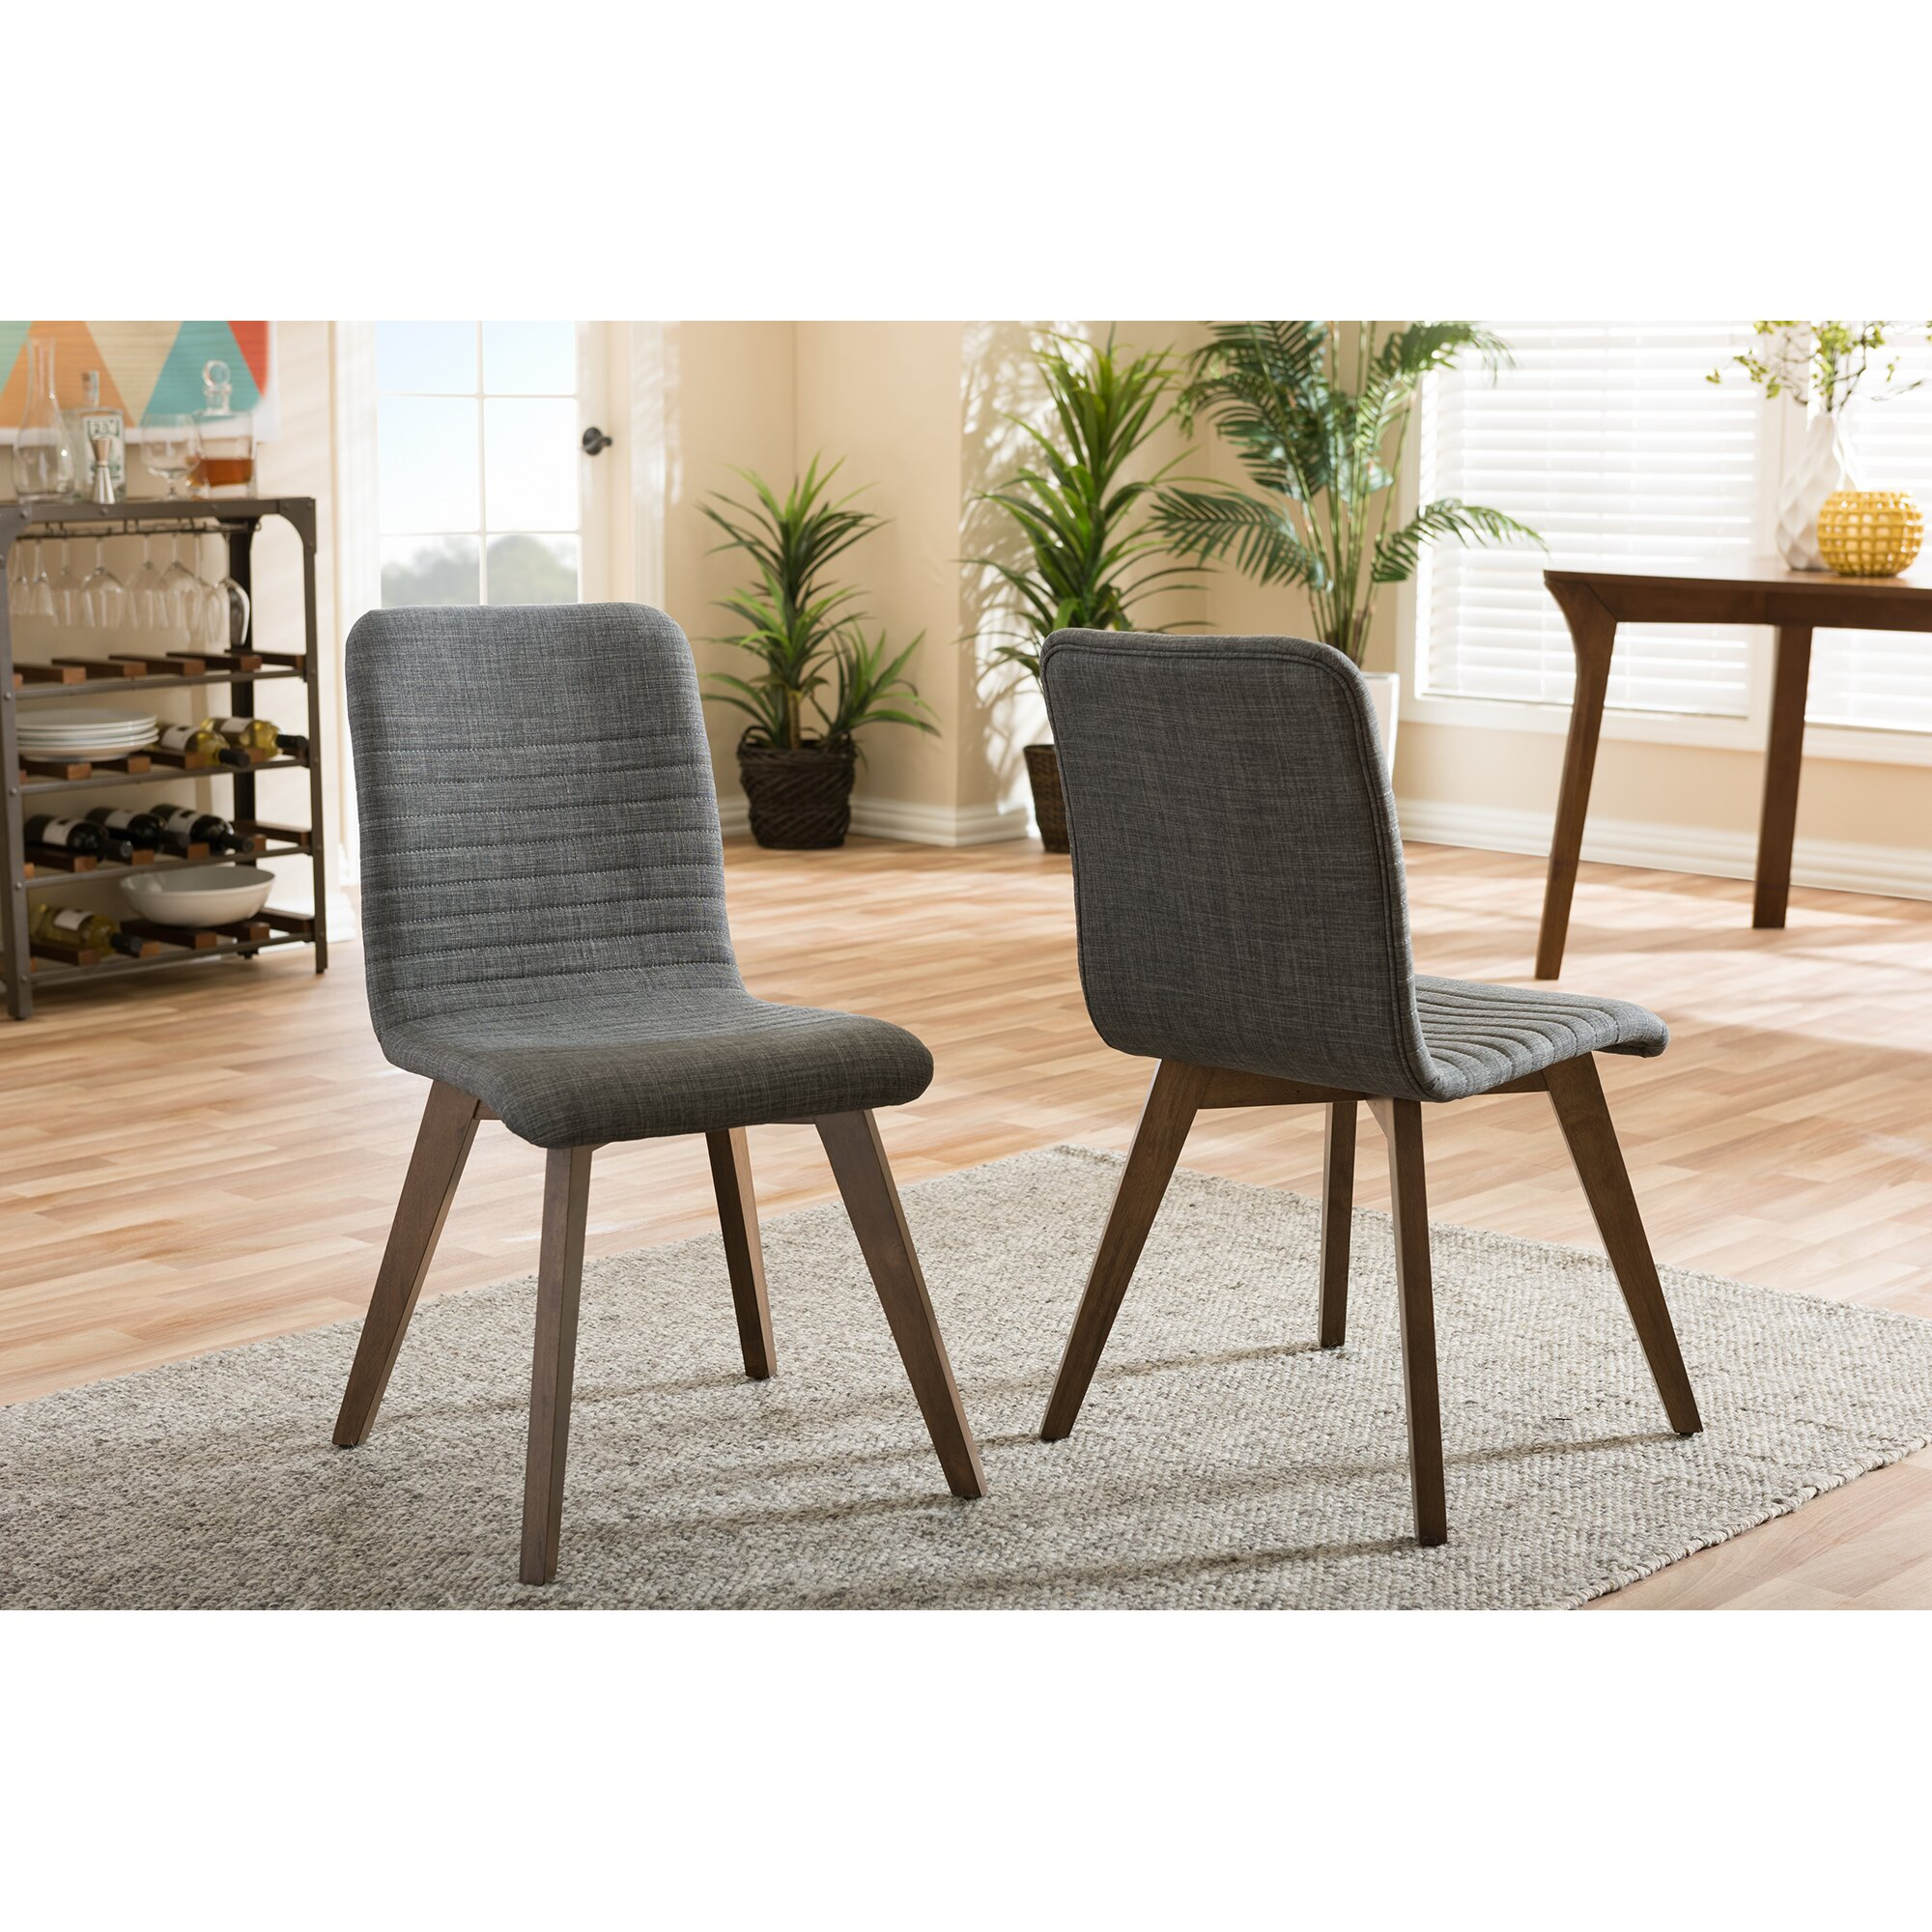 Wholesale interiors baxton studio parsons chair reviews for Baxton studio